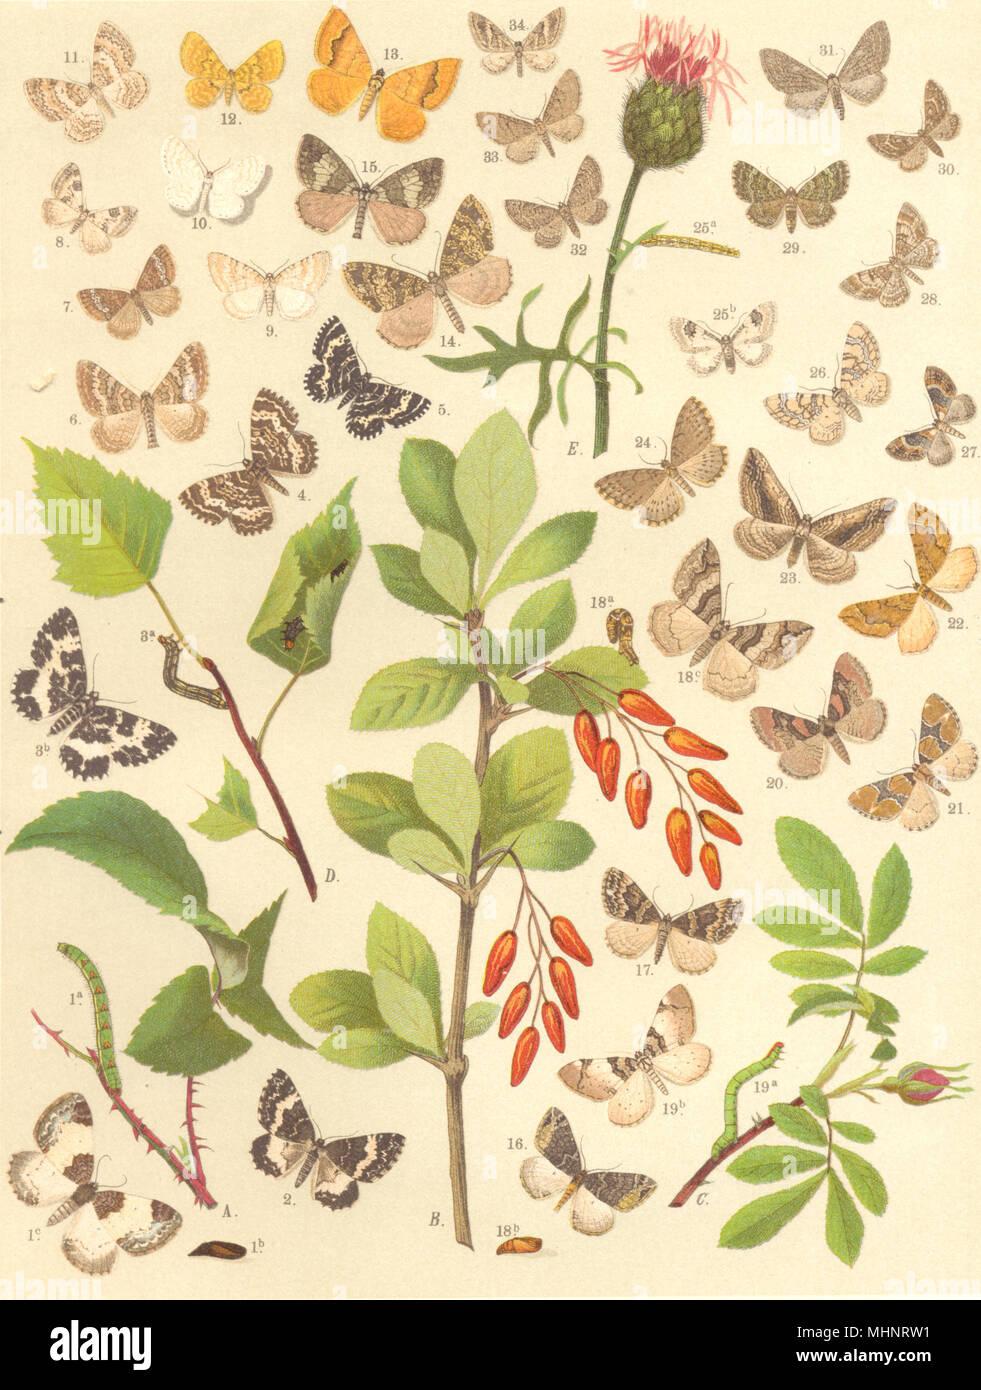 LOOPER MOTHS. Beautiful Carpet. Argent Sable; Pretty Pinion; Grass Rivulet 1903 - Stock Image